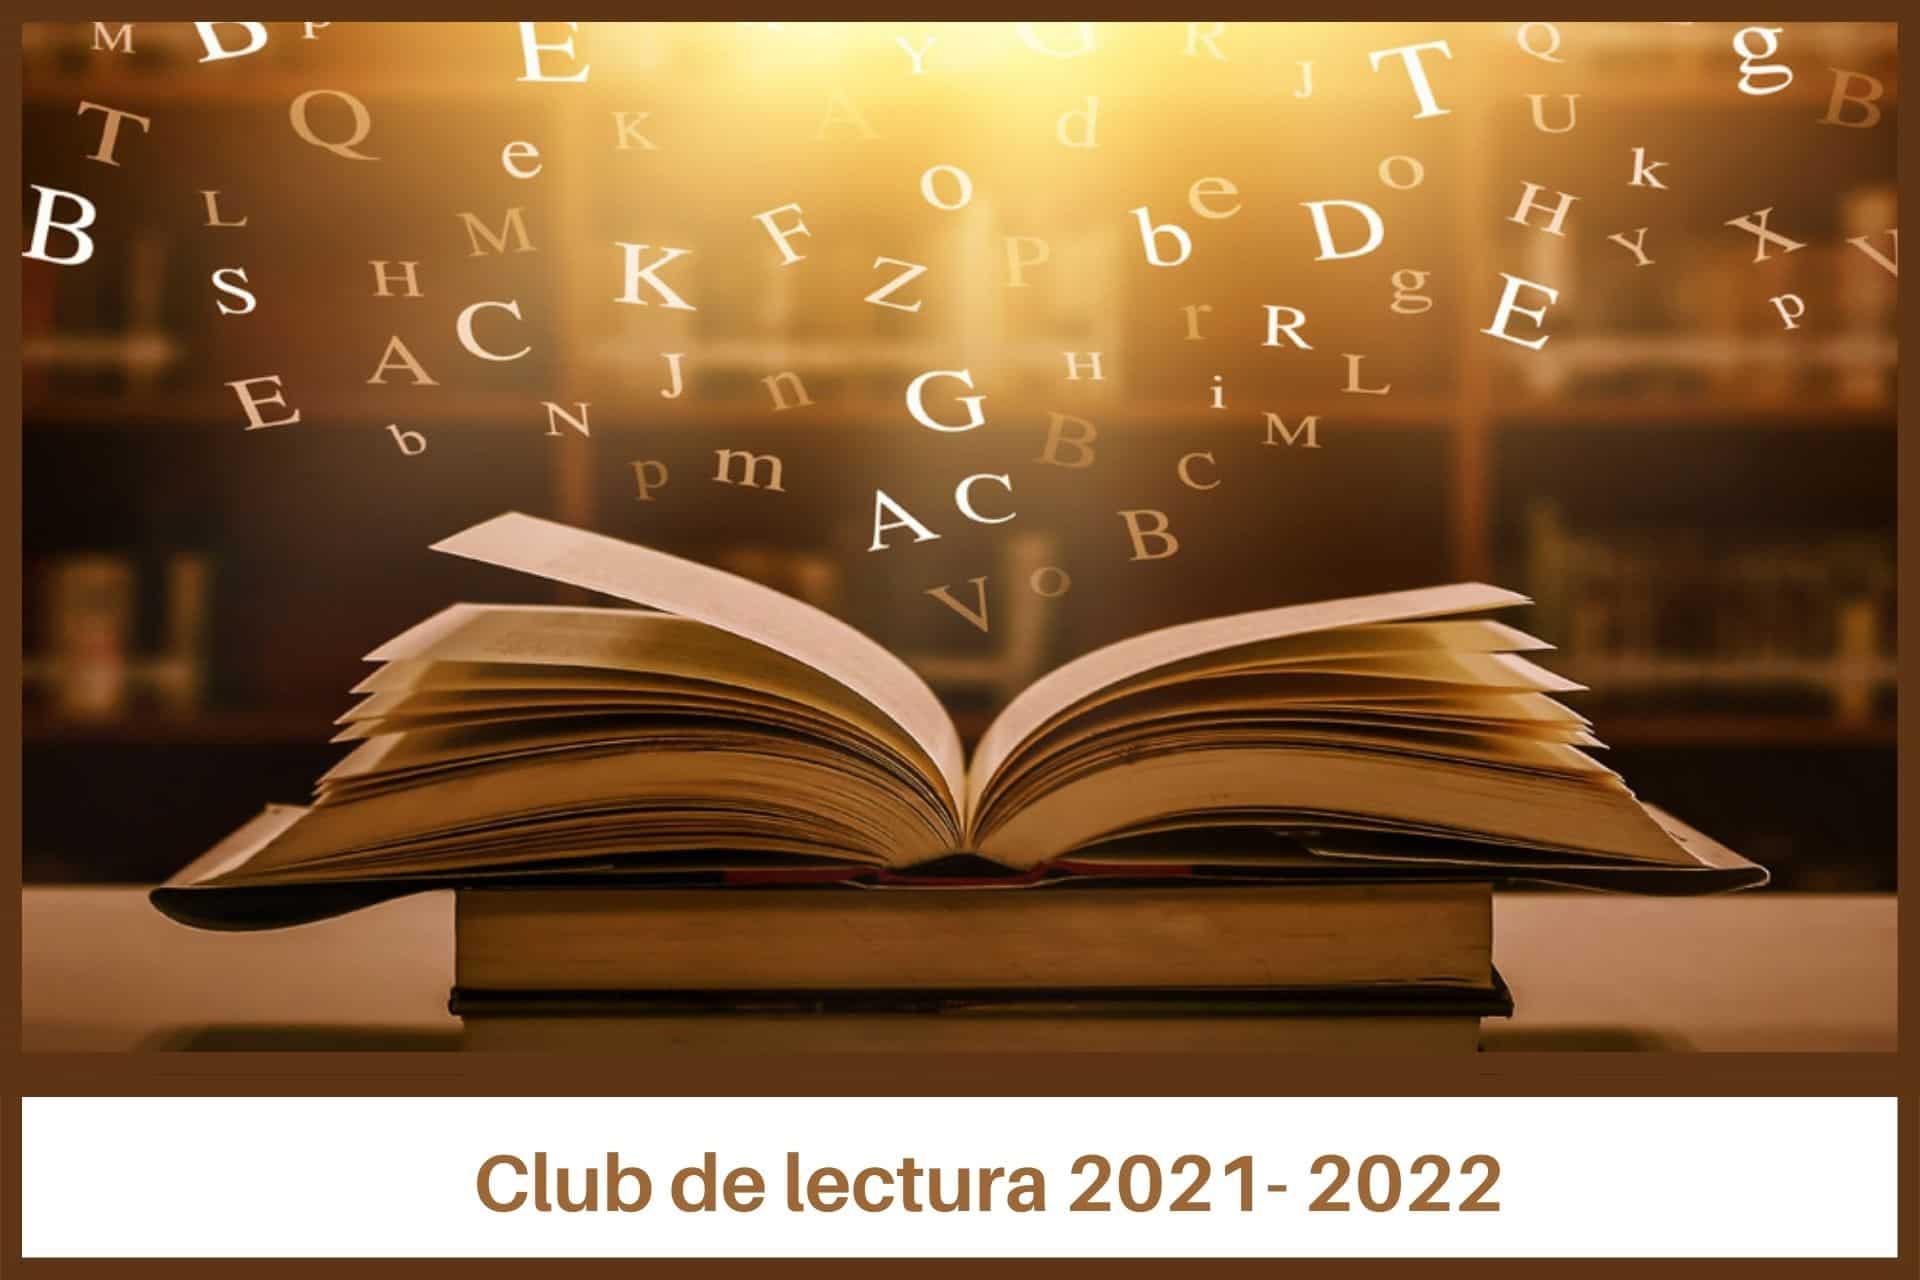 Club de lectura 2021-2022